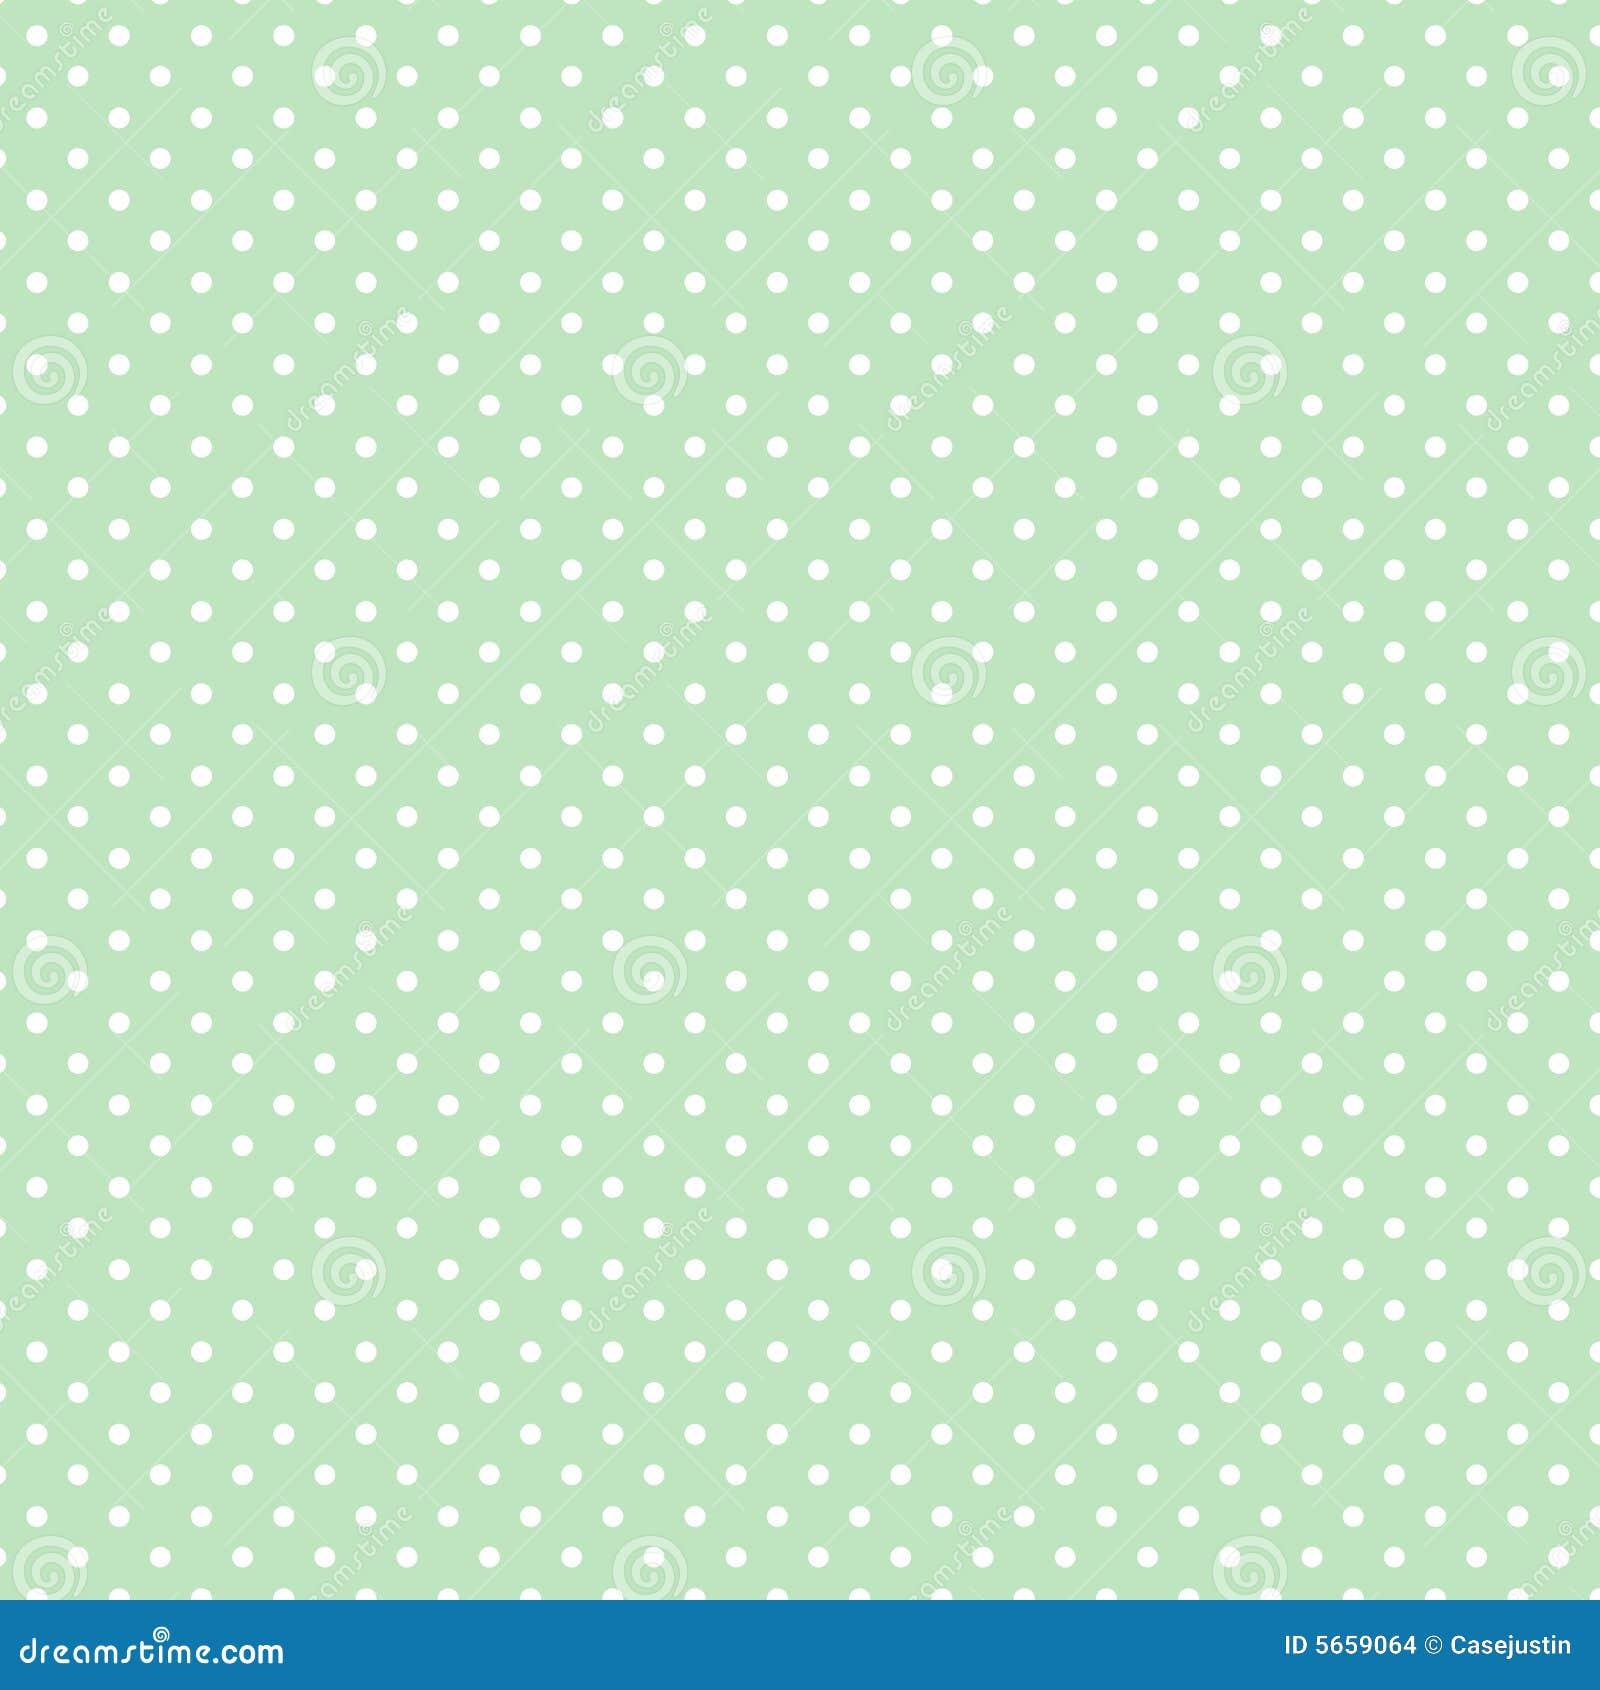 Small White Polka dots on Pastel Green, Seamless Background